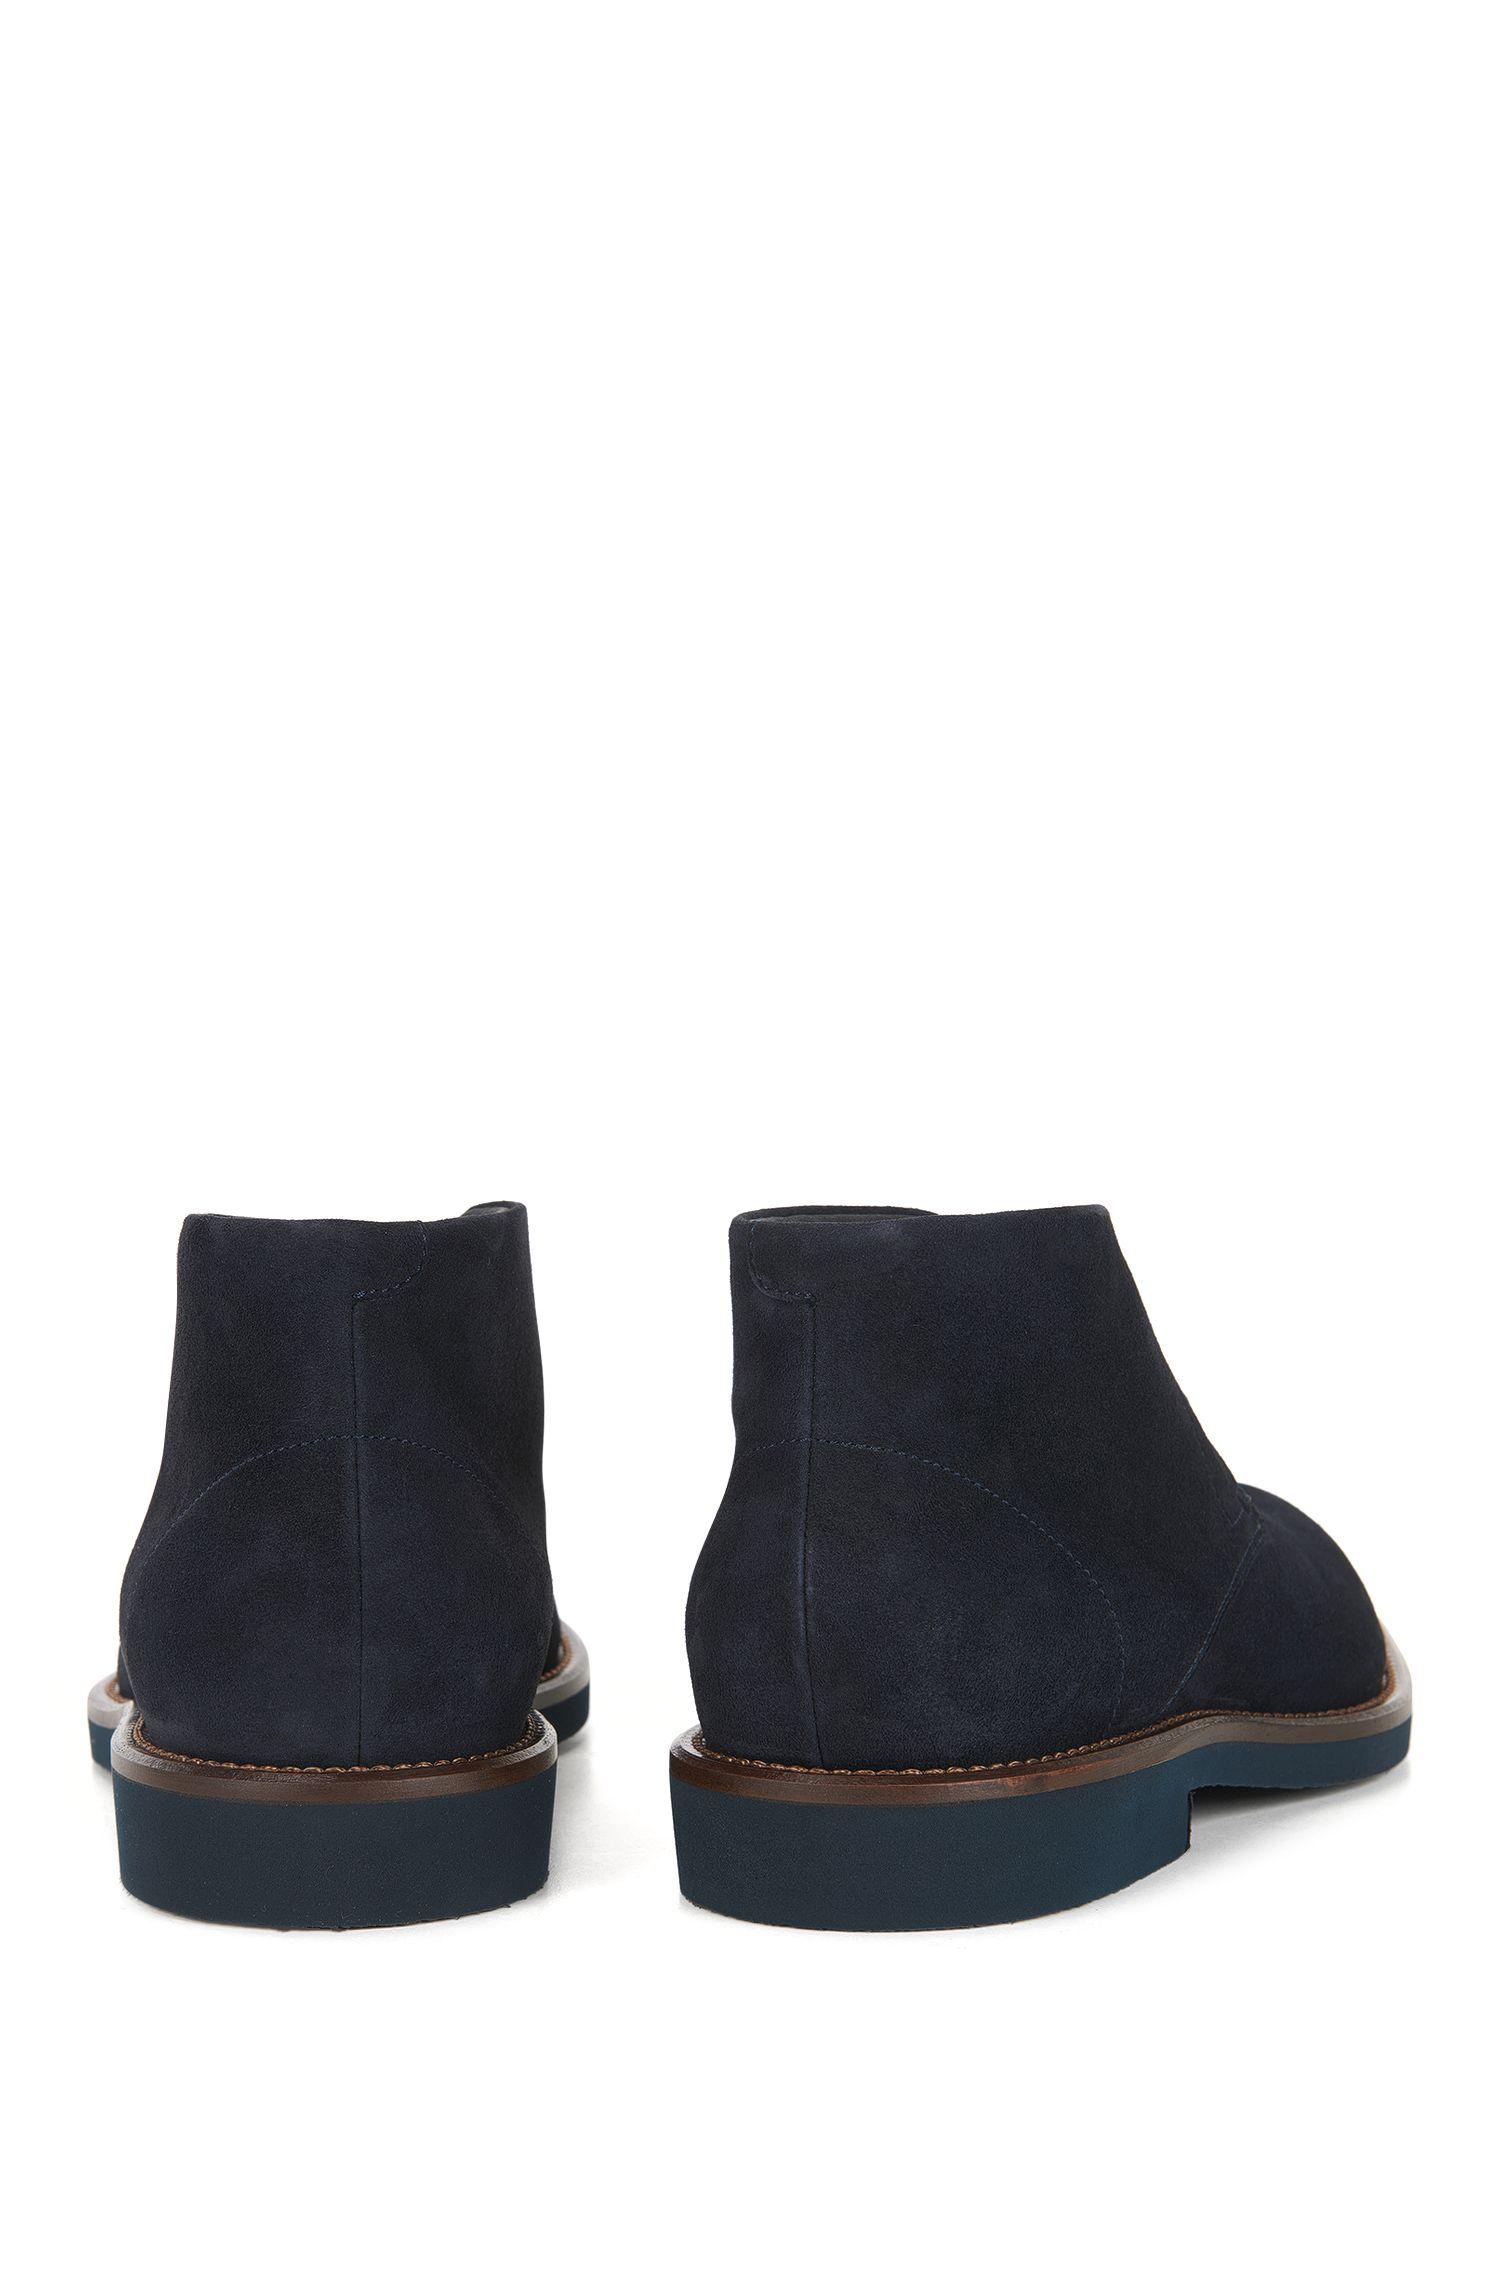 Italian Suede Desert Boot | Eden Desb Sdg, Dark Blue